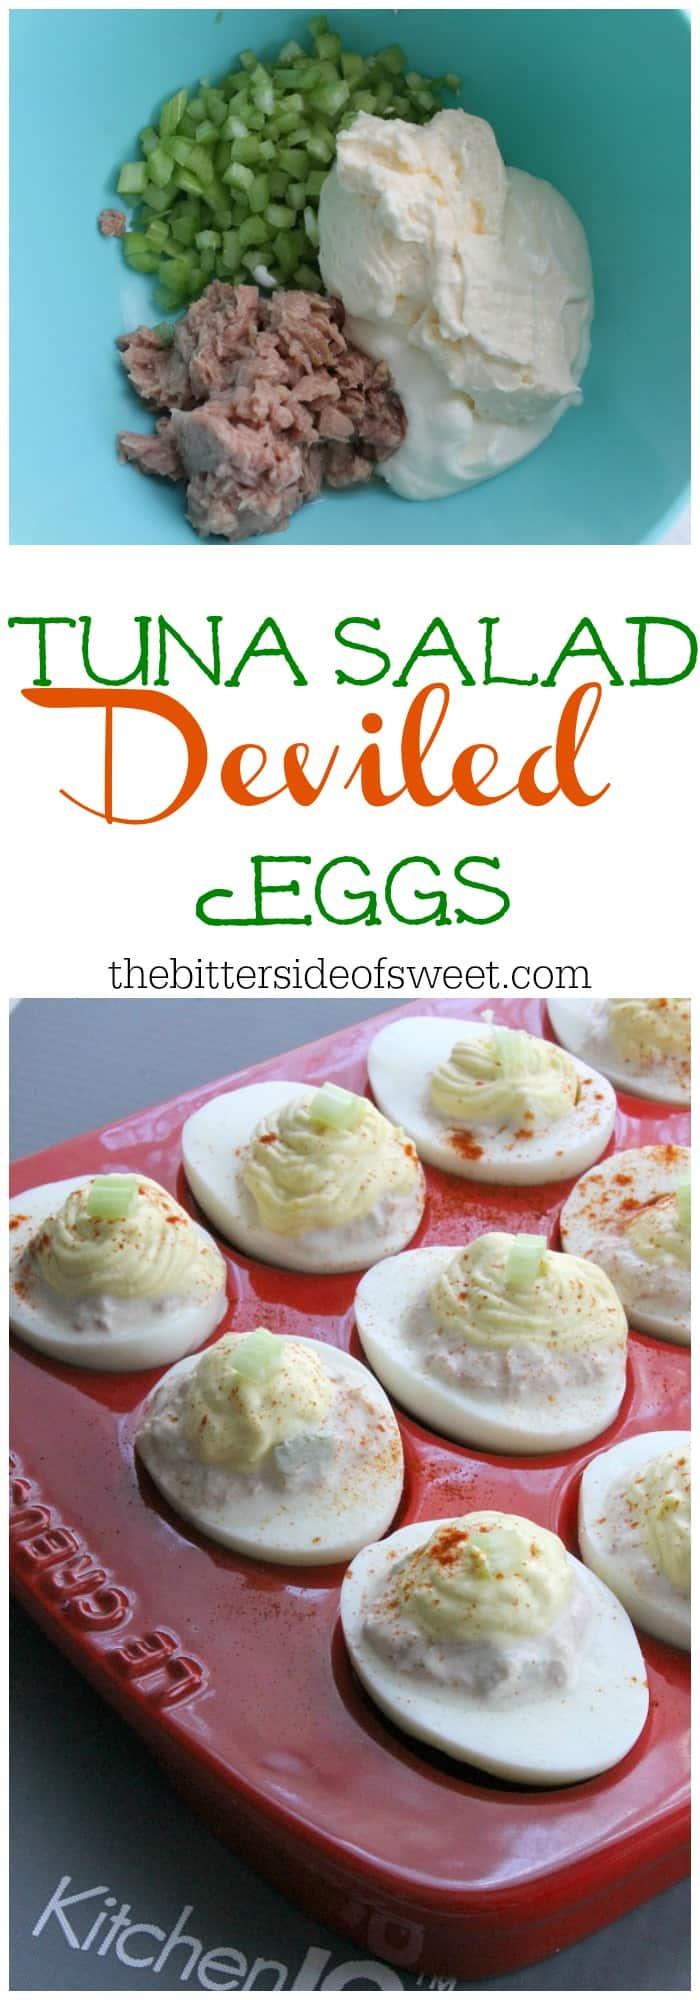 tuna salad stuffed eggs